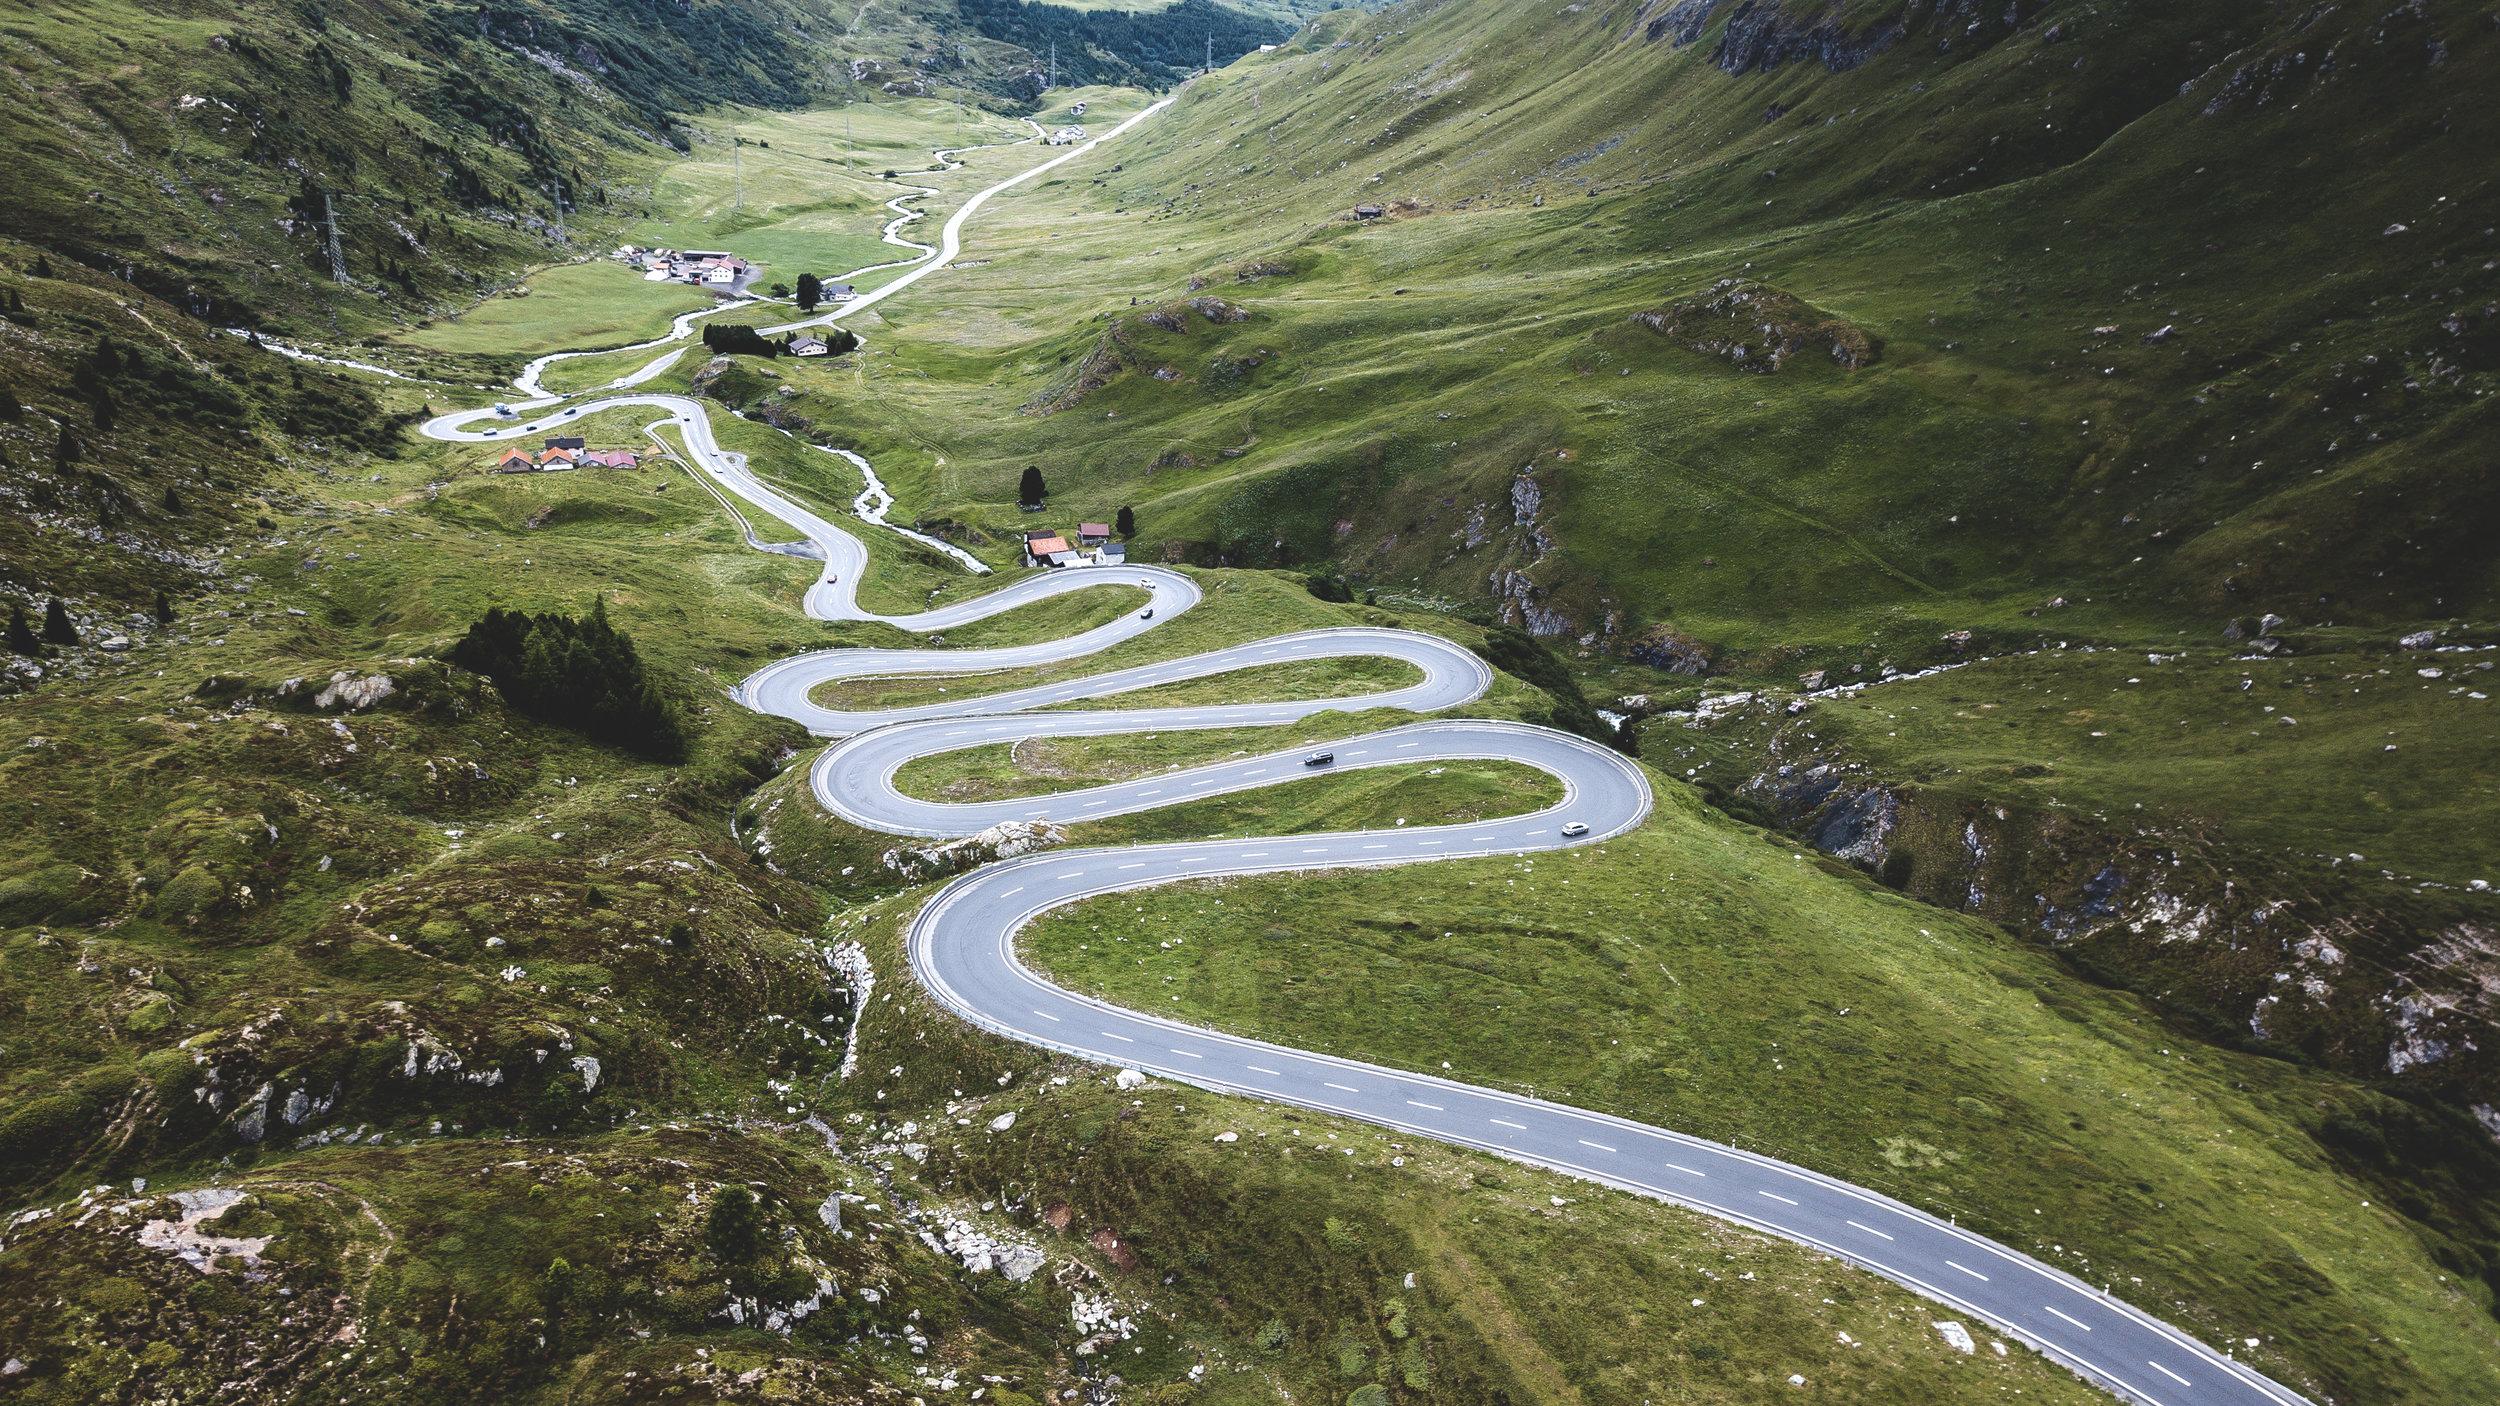 Julier Pass, Switzerland